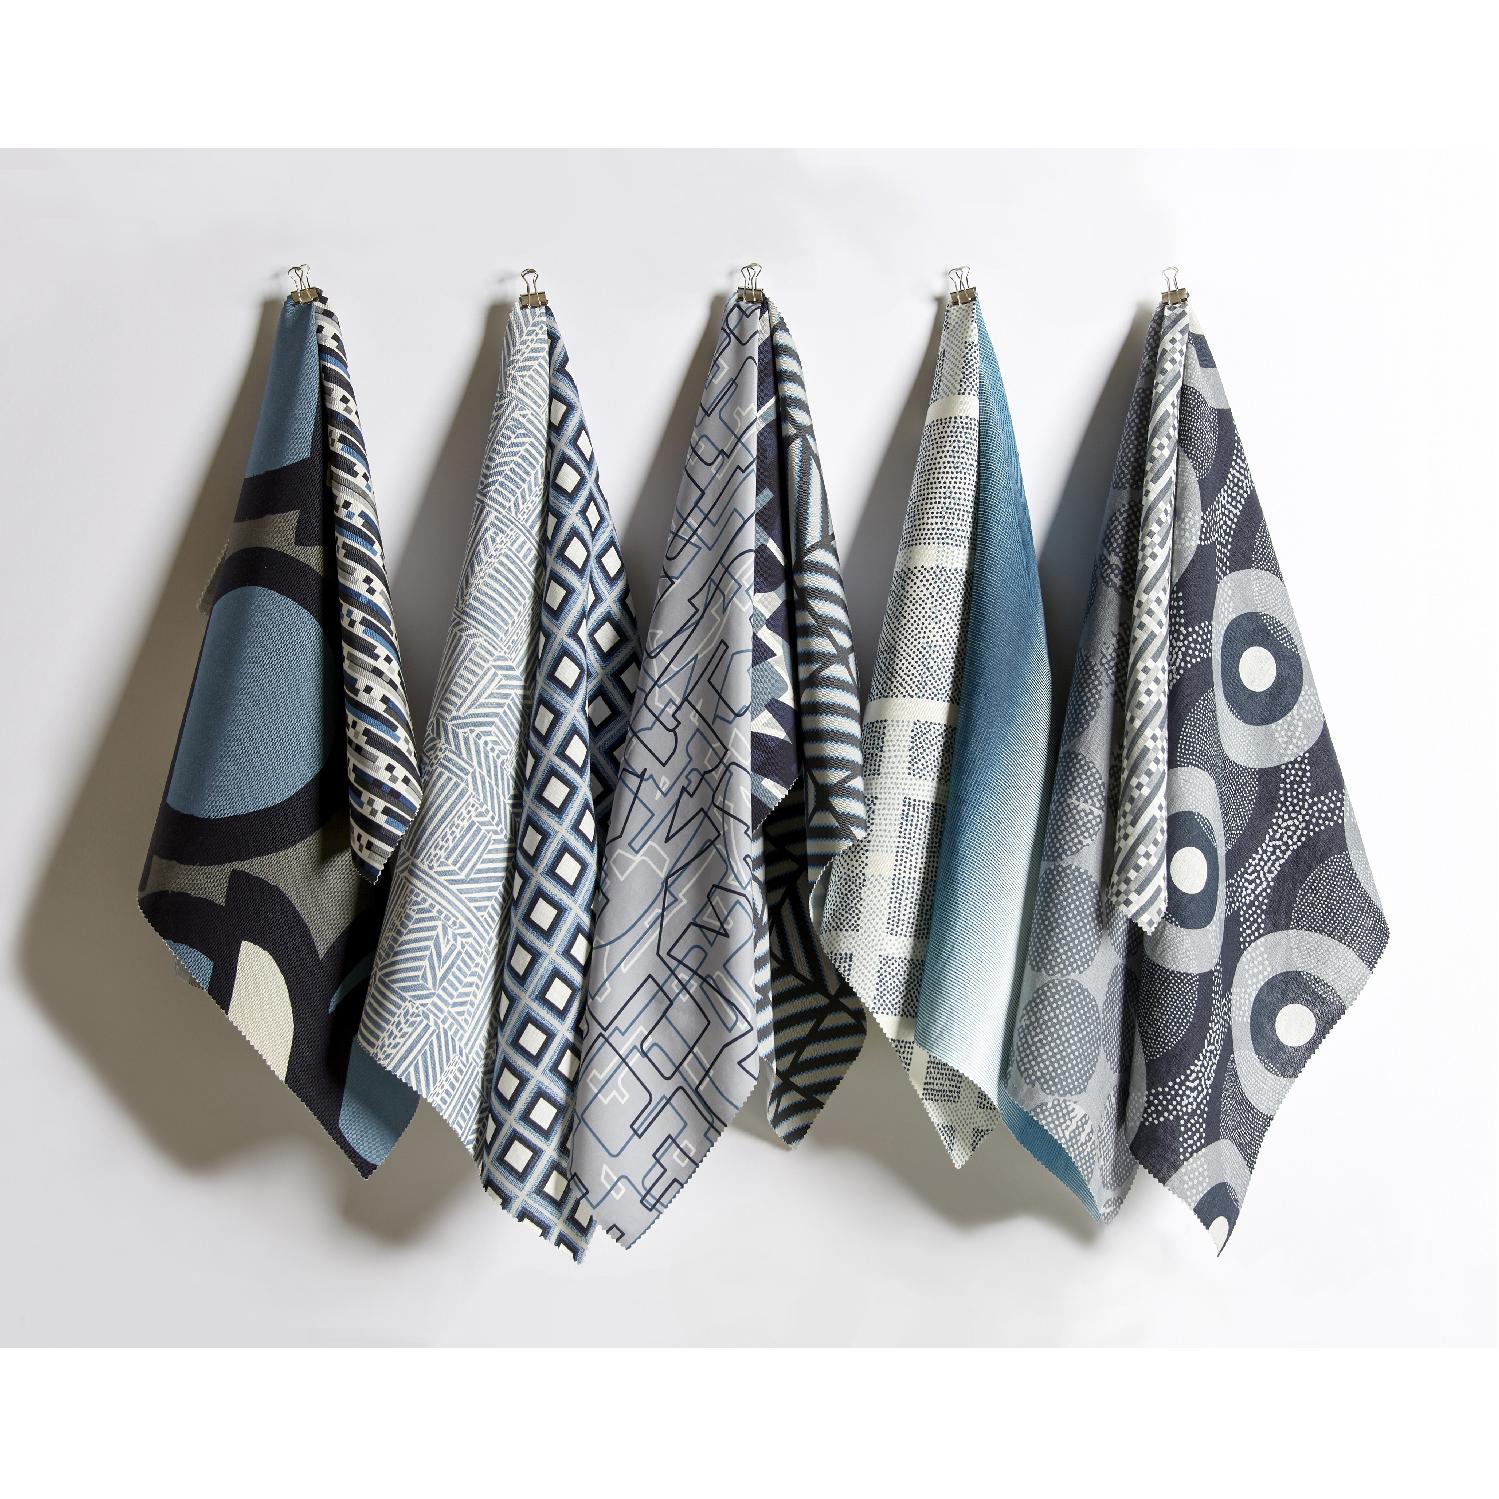 alexandra_palmowski_icy_blue_fabric_collection.jpg